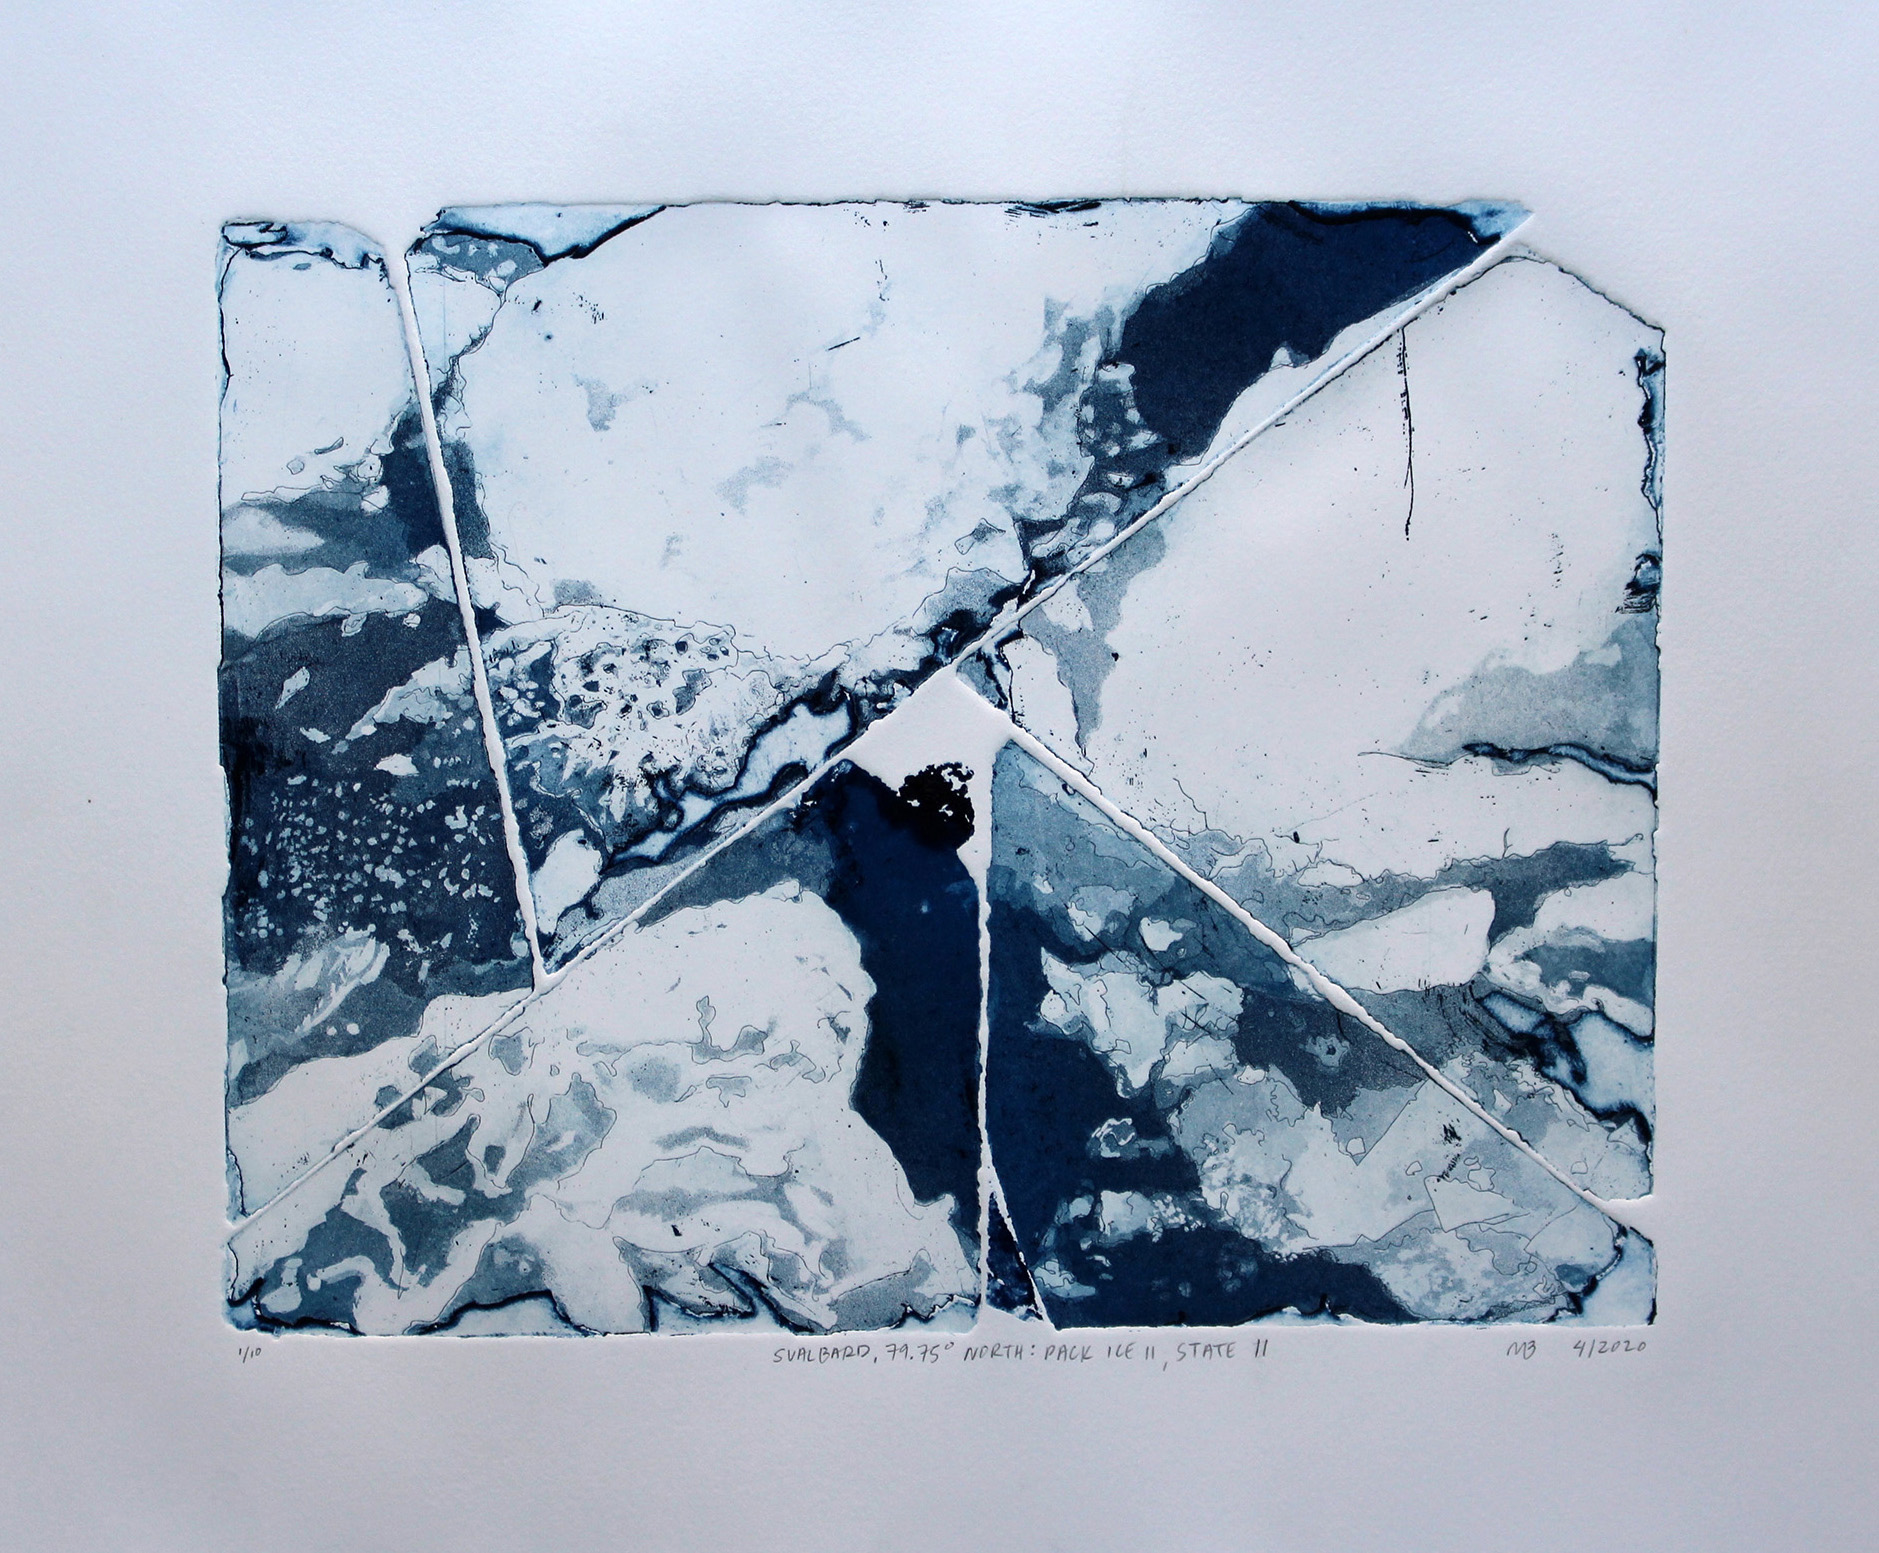 Megan Broughton; Svalbard, 79.75° North, Pack Ice II, State II; intaglio hardground etching and aquatint; 18 x 21 in; 2020